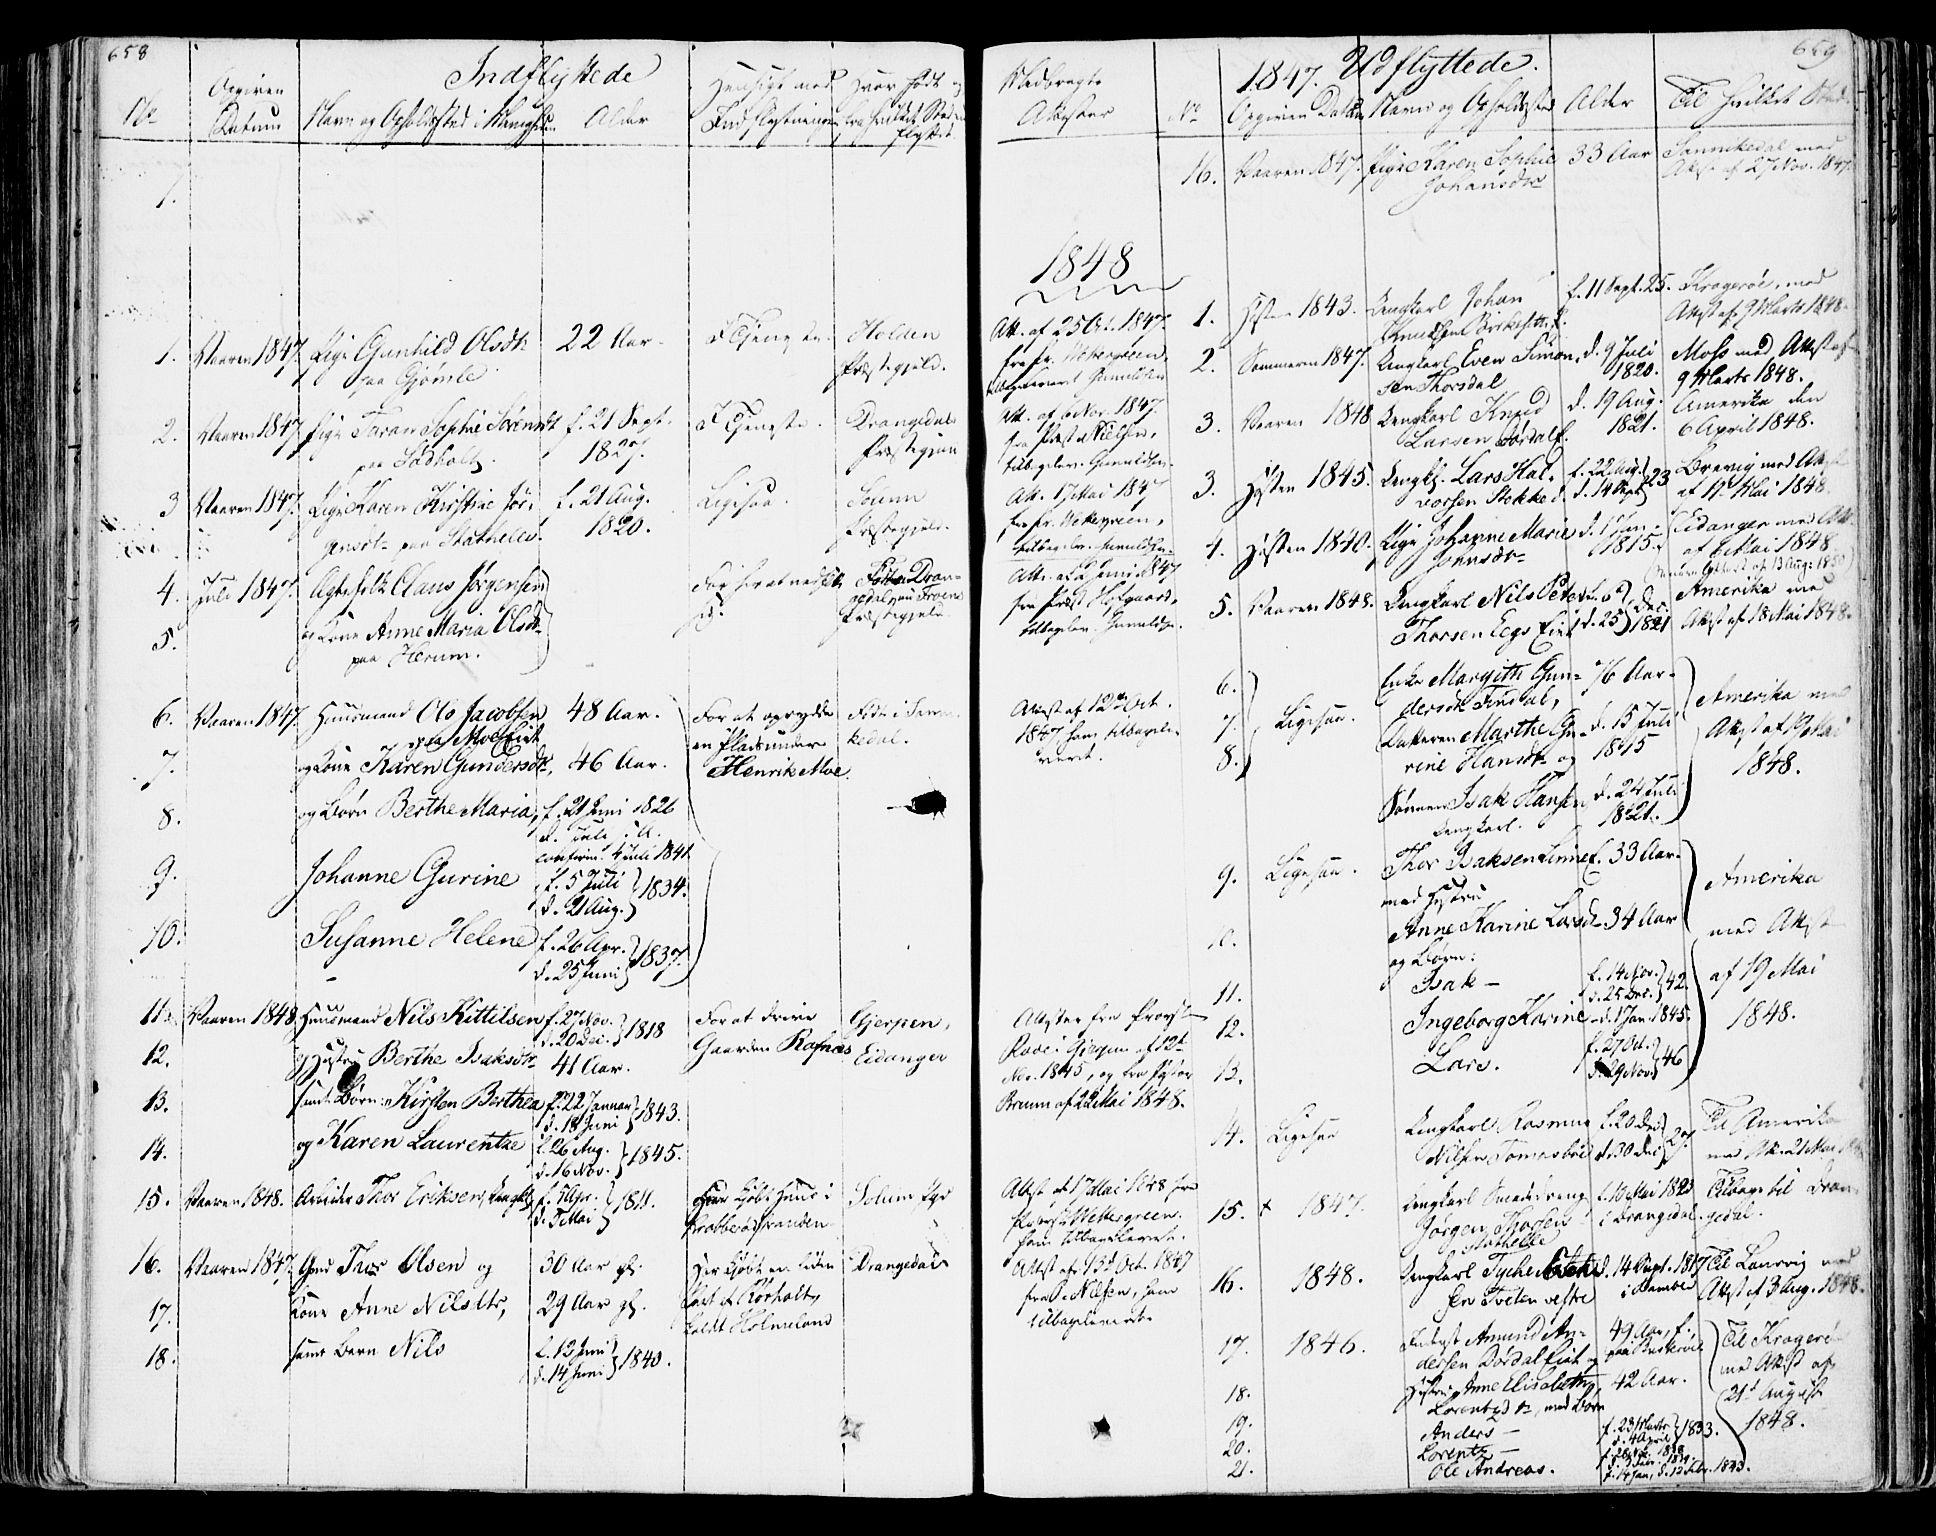 SAKO, Bamble kirkebøker, F/Fa/L0004: Ministerialbok nr. I 4, 1834-1853, s. 658-659